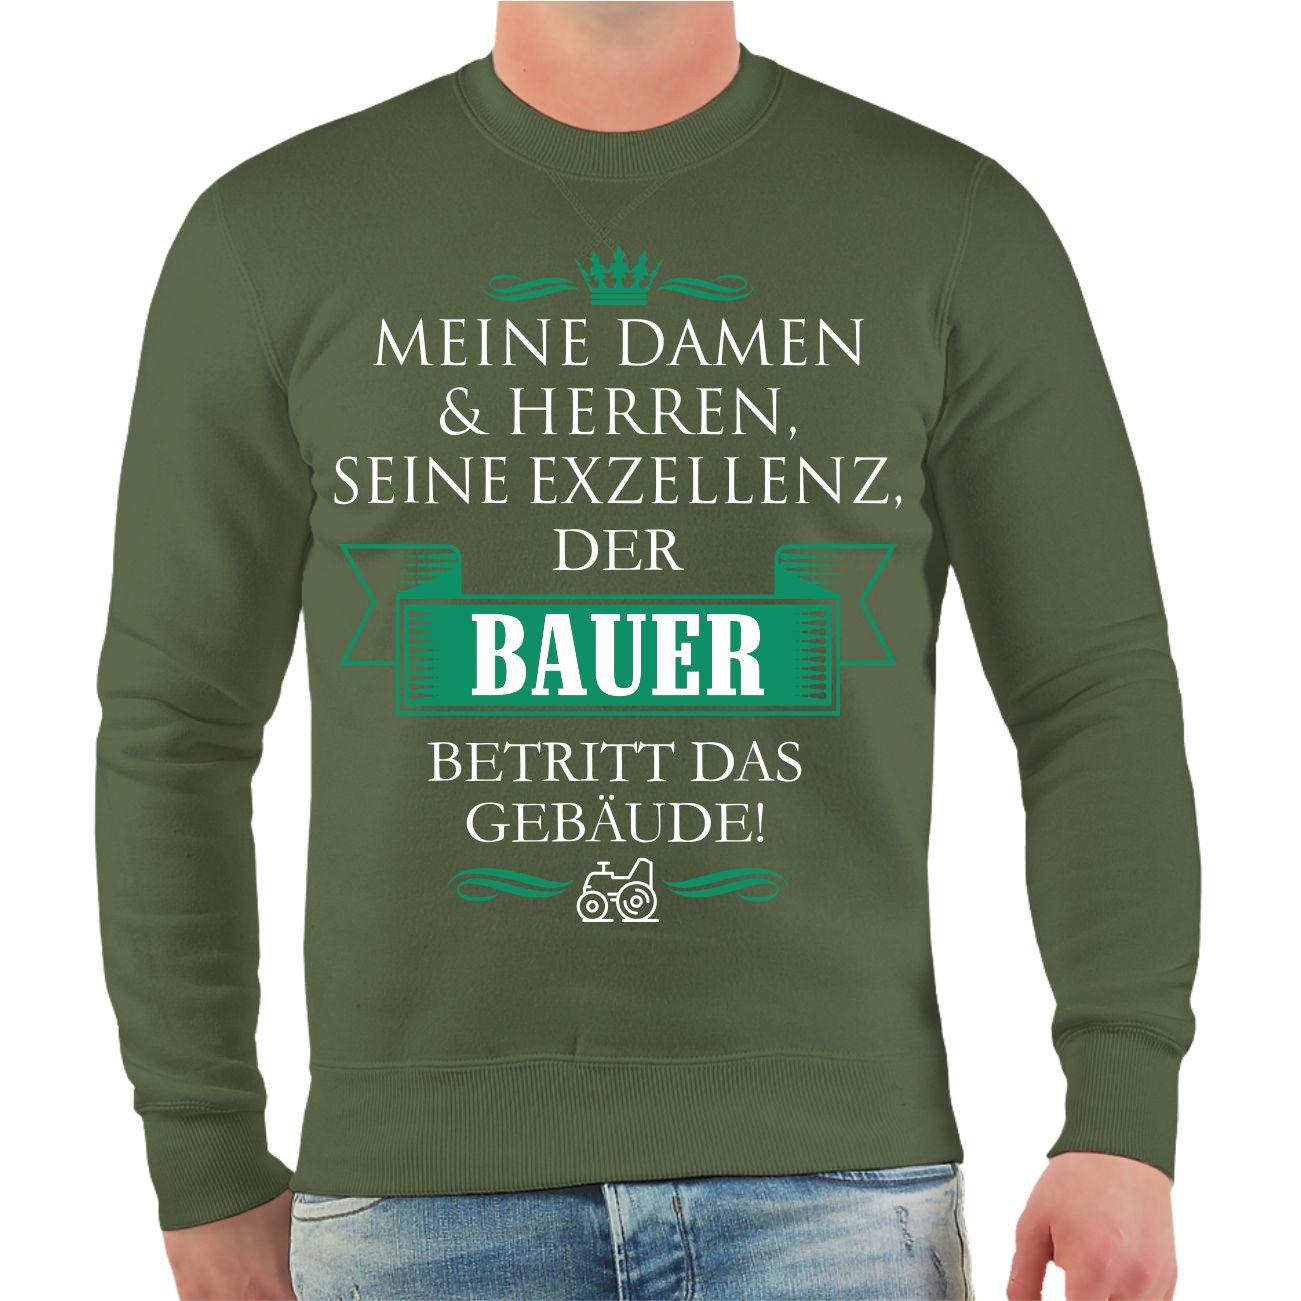 quality design 9a937 f8e0e Spruch Geschenk Sweatshirt Fun Bauer Agrar Der Pullover ...